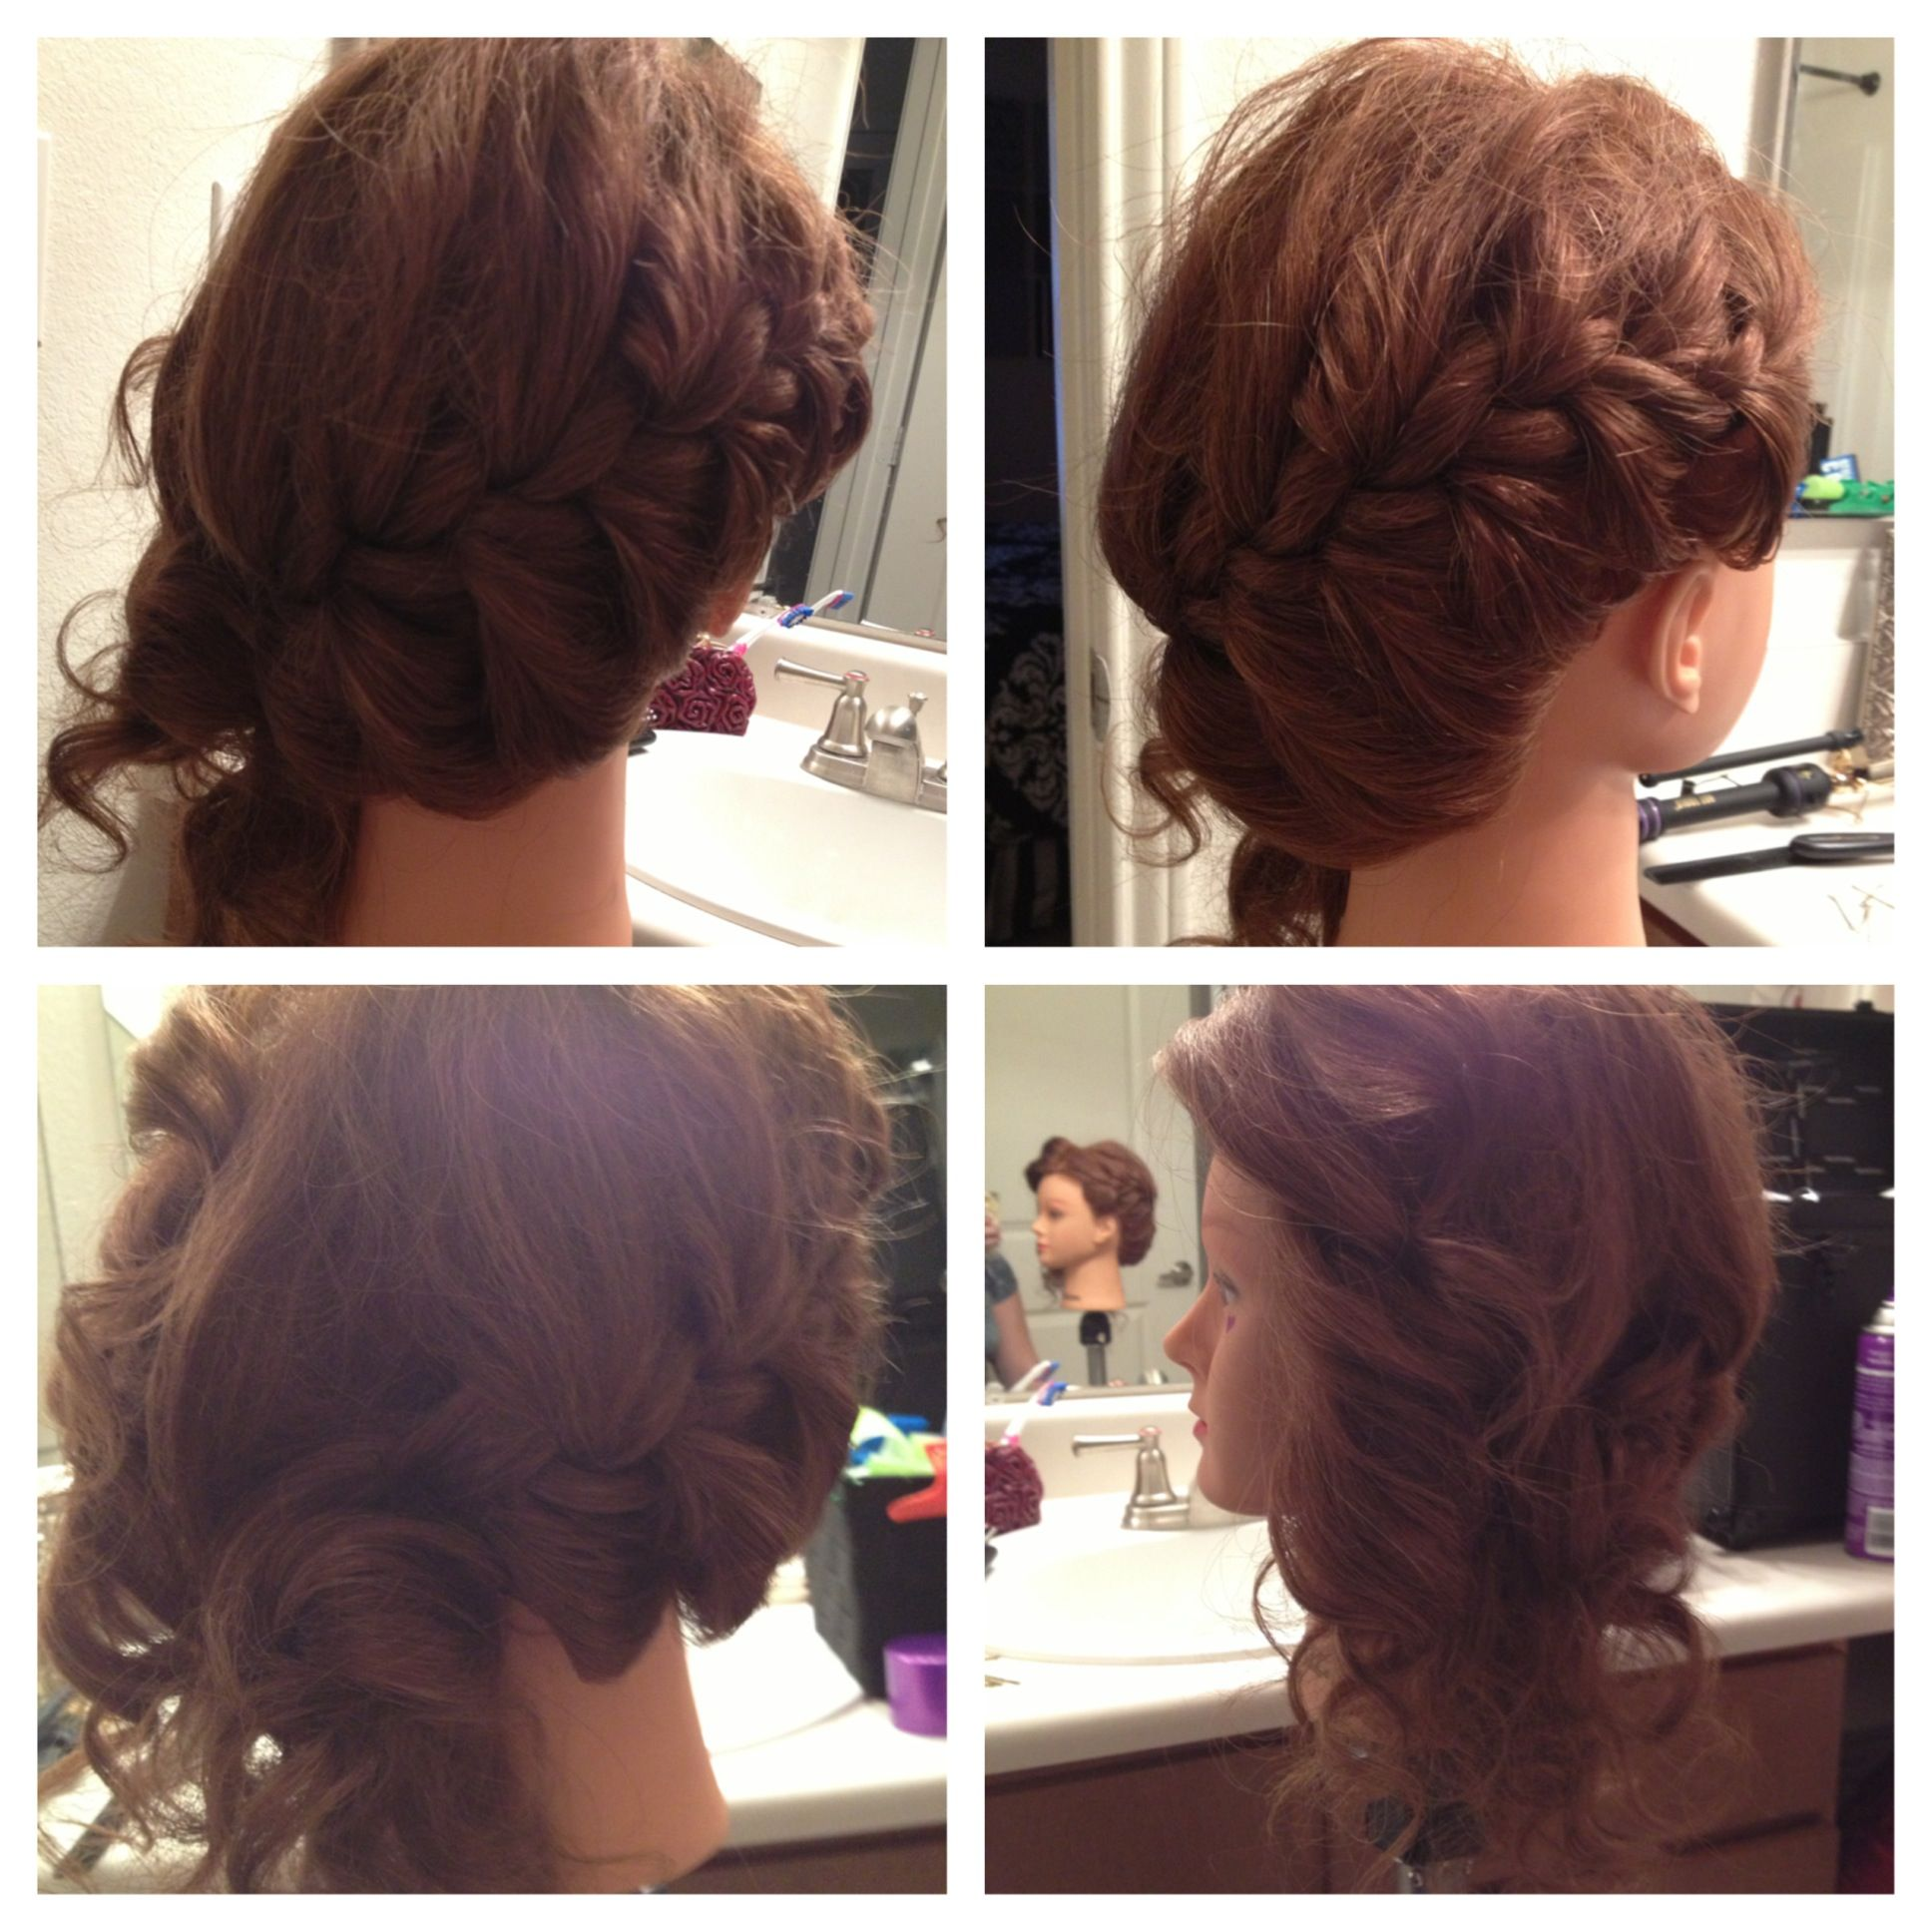 Prom hairside braid with curls on side wedding designs